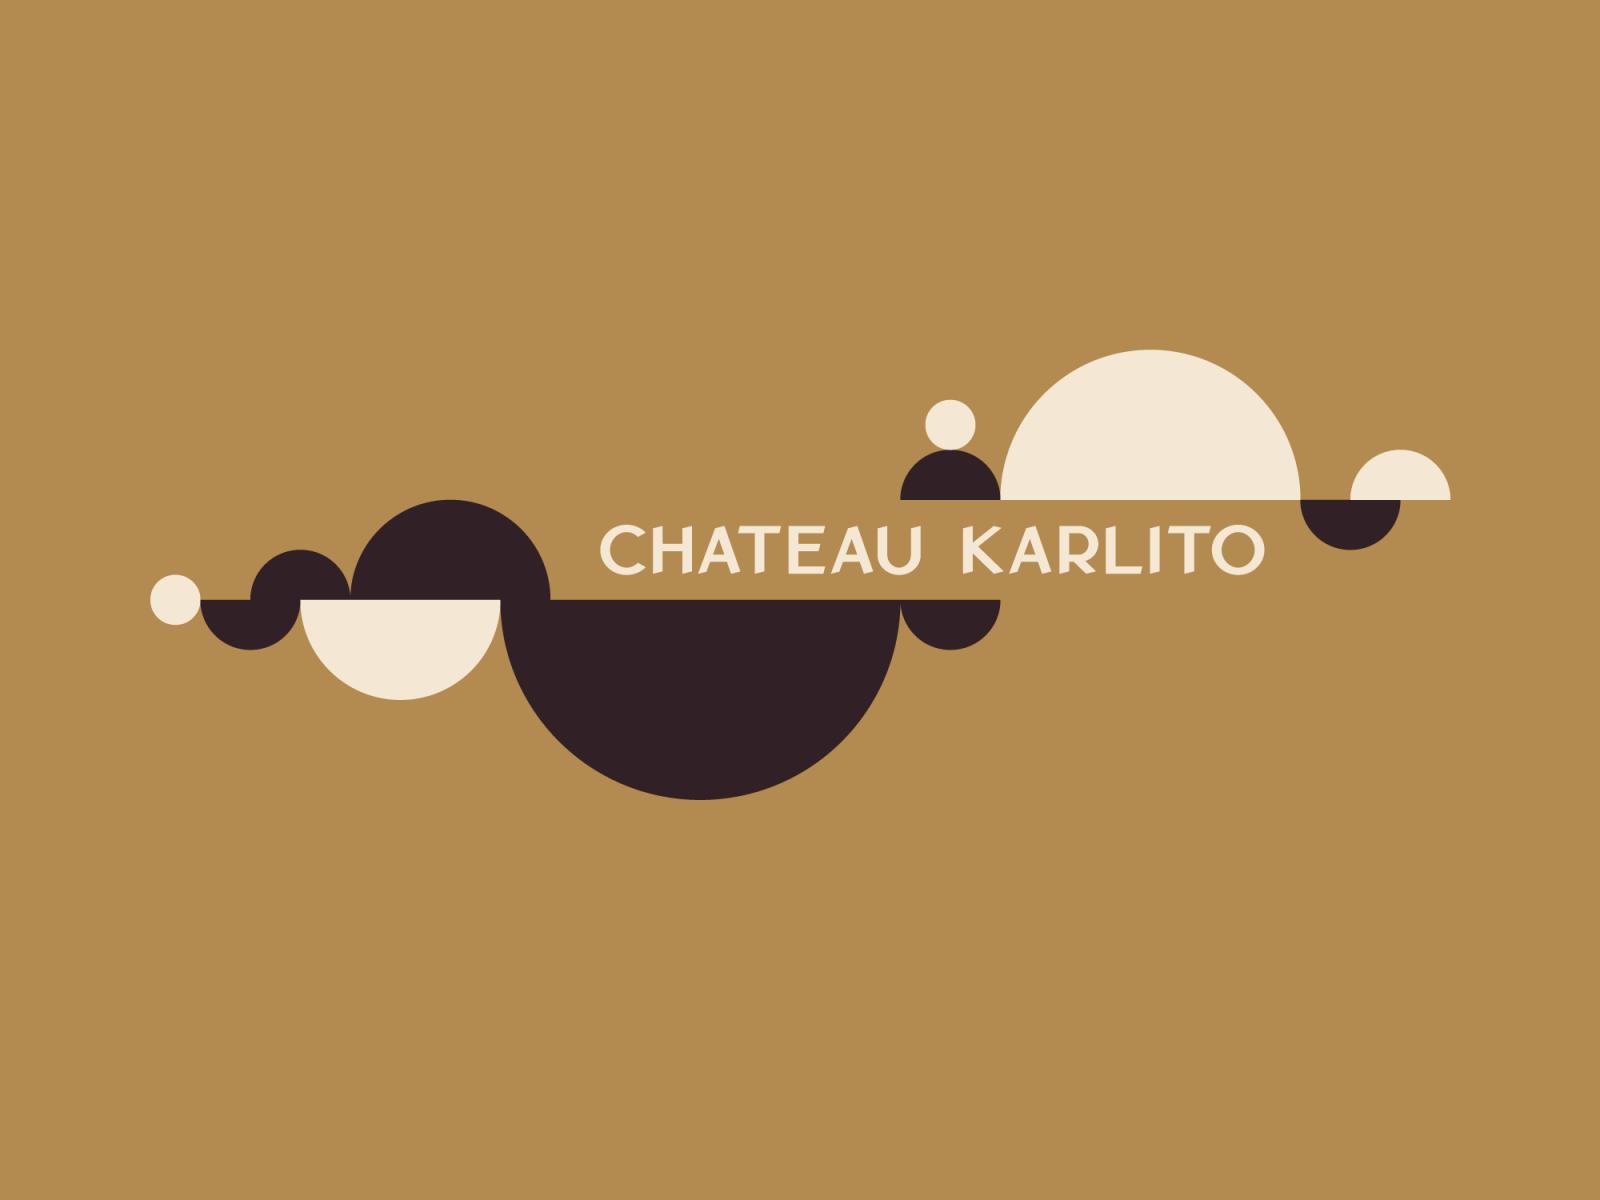 Chateau karlito logo and illustration